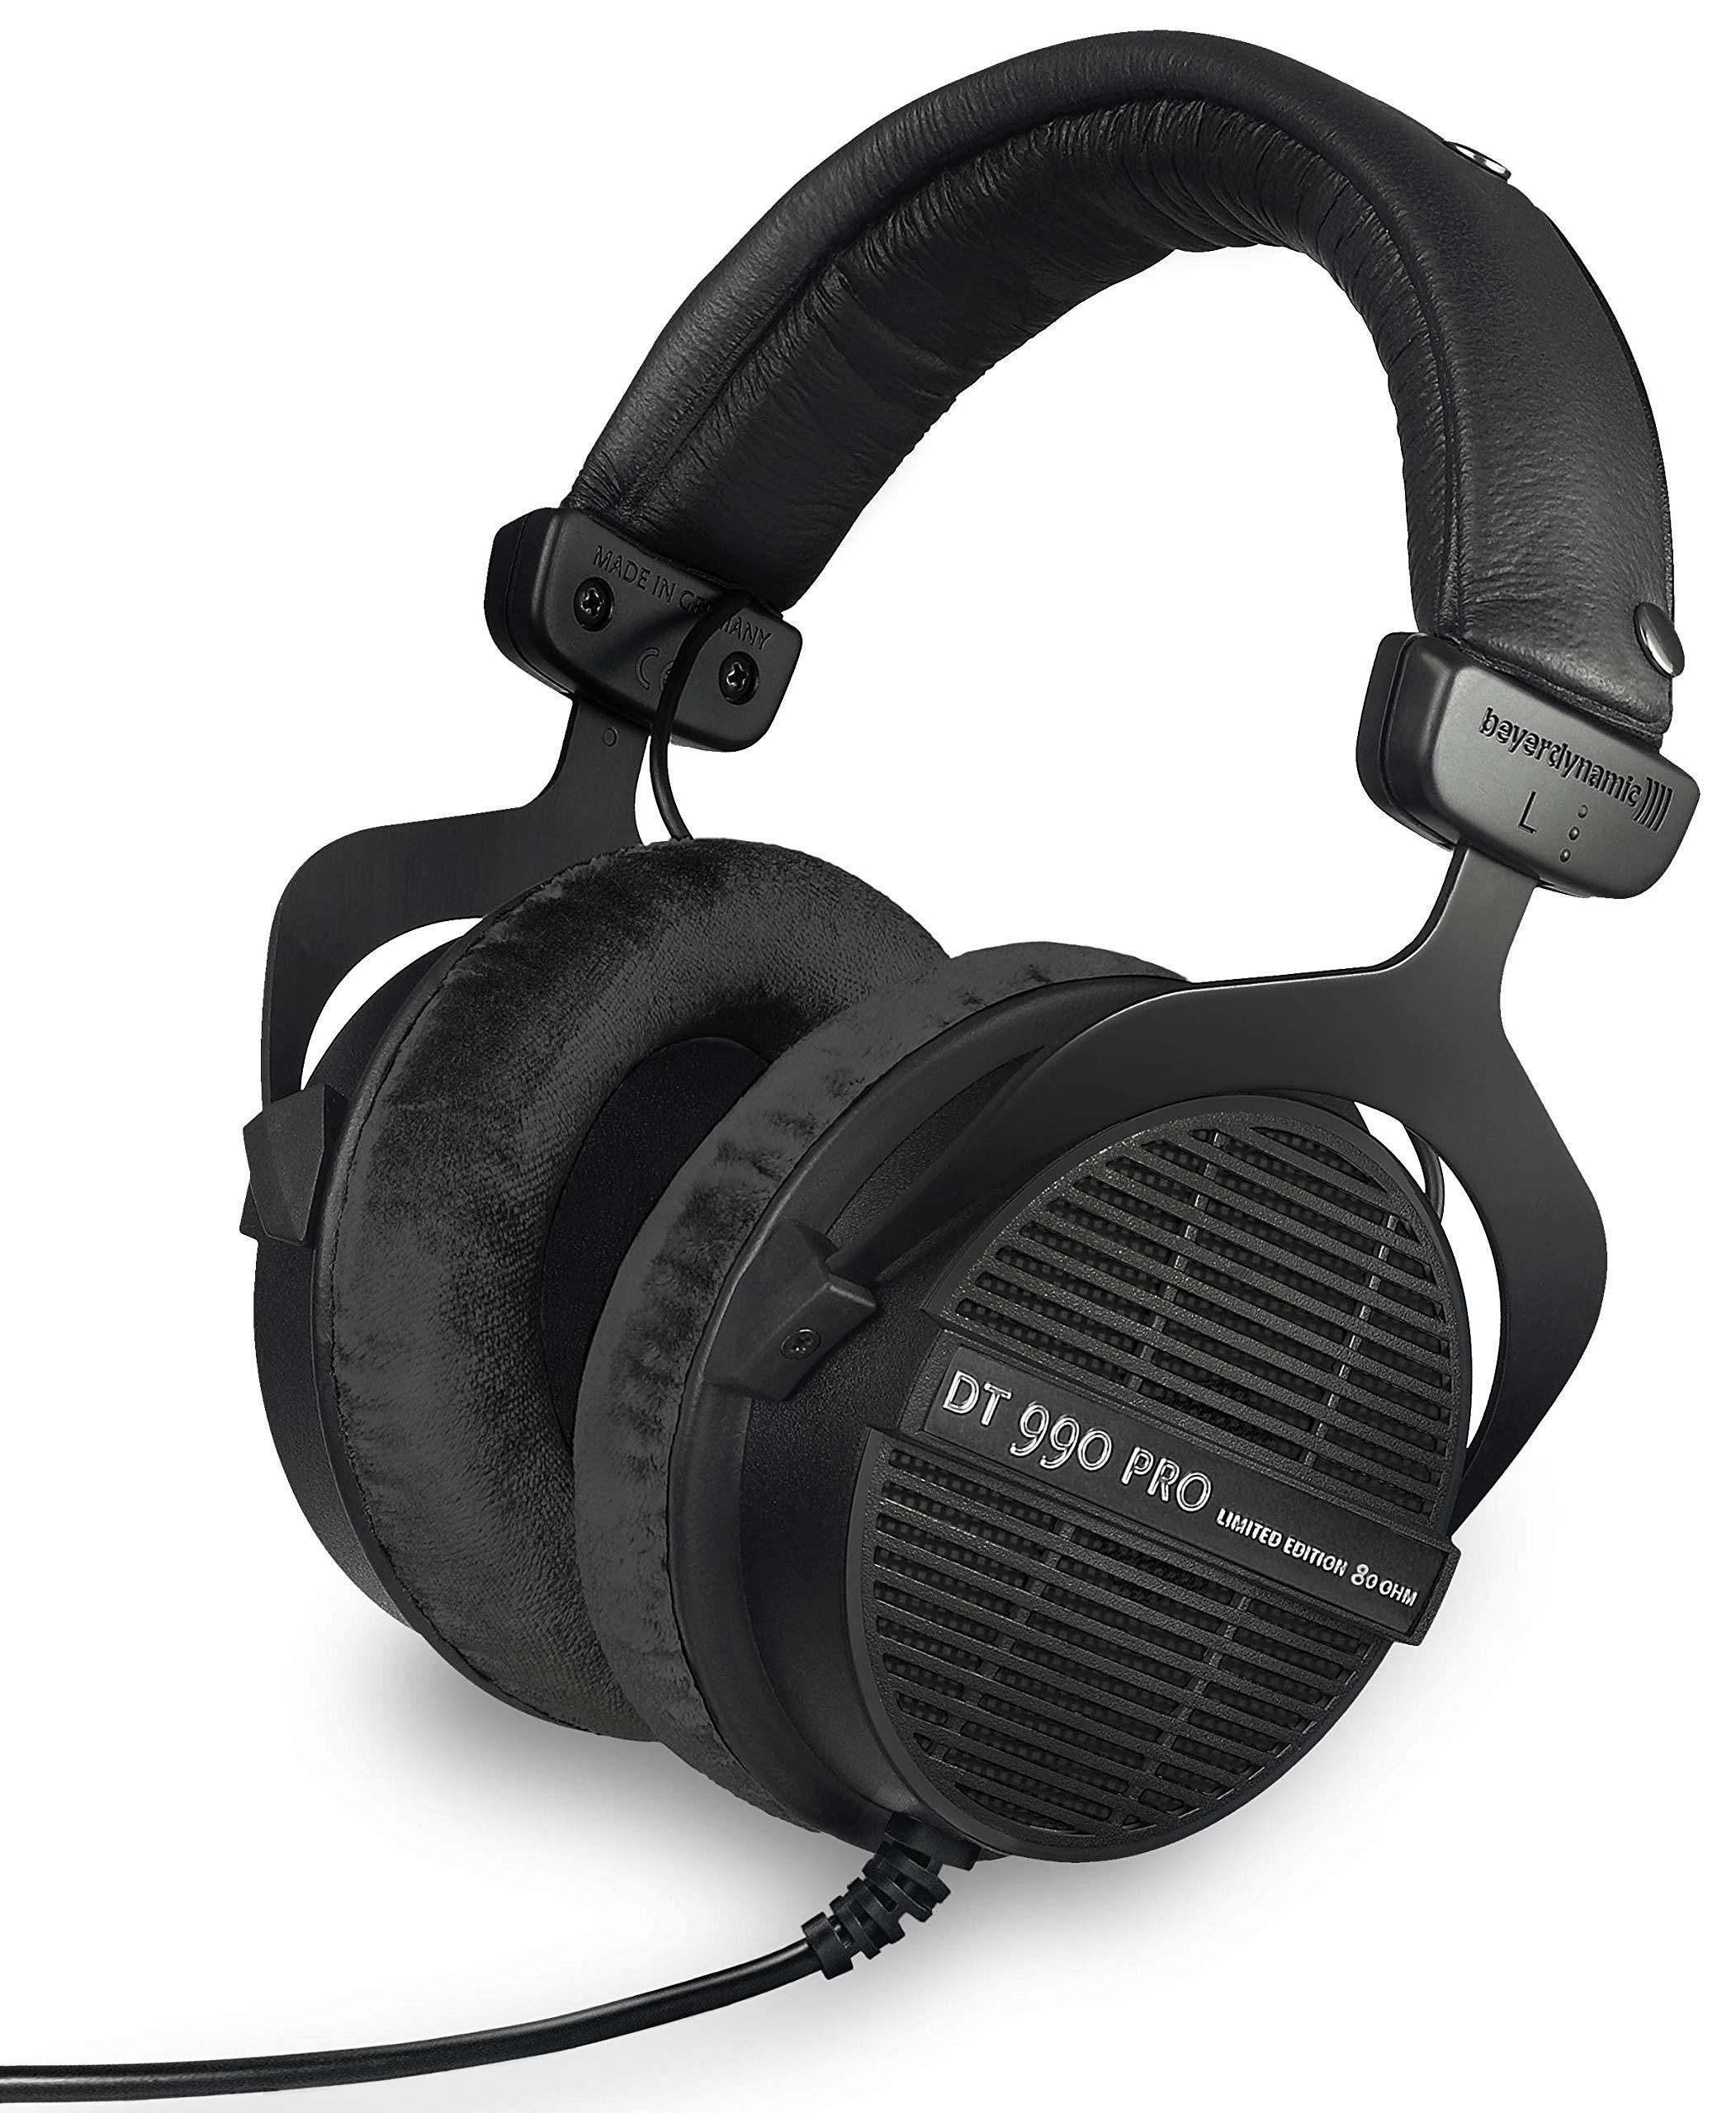 beyerdynamic DT 990 PRO Over-Ear Studio Monitor Headphones – Open-Back Stereo Construction, Wired